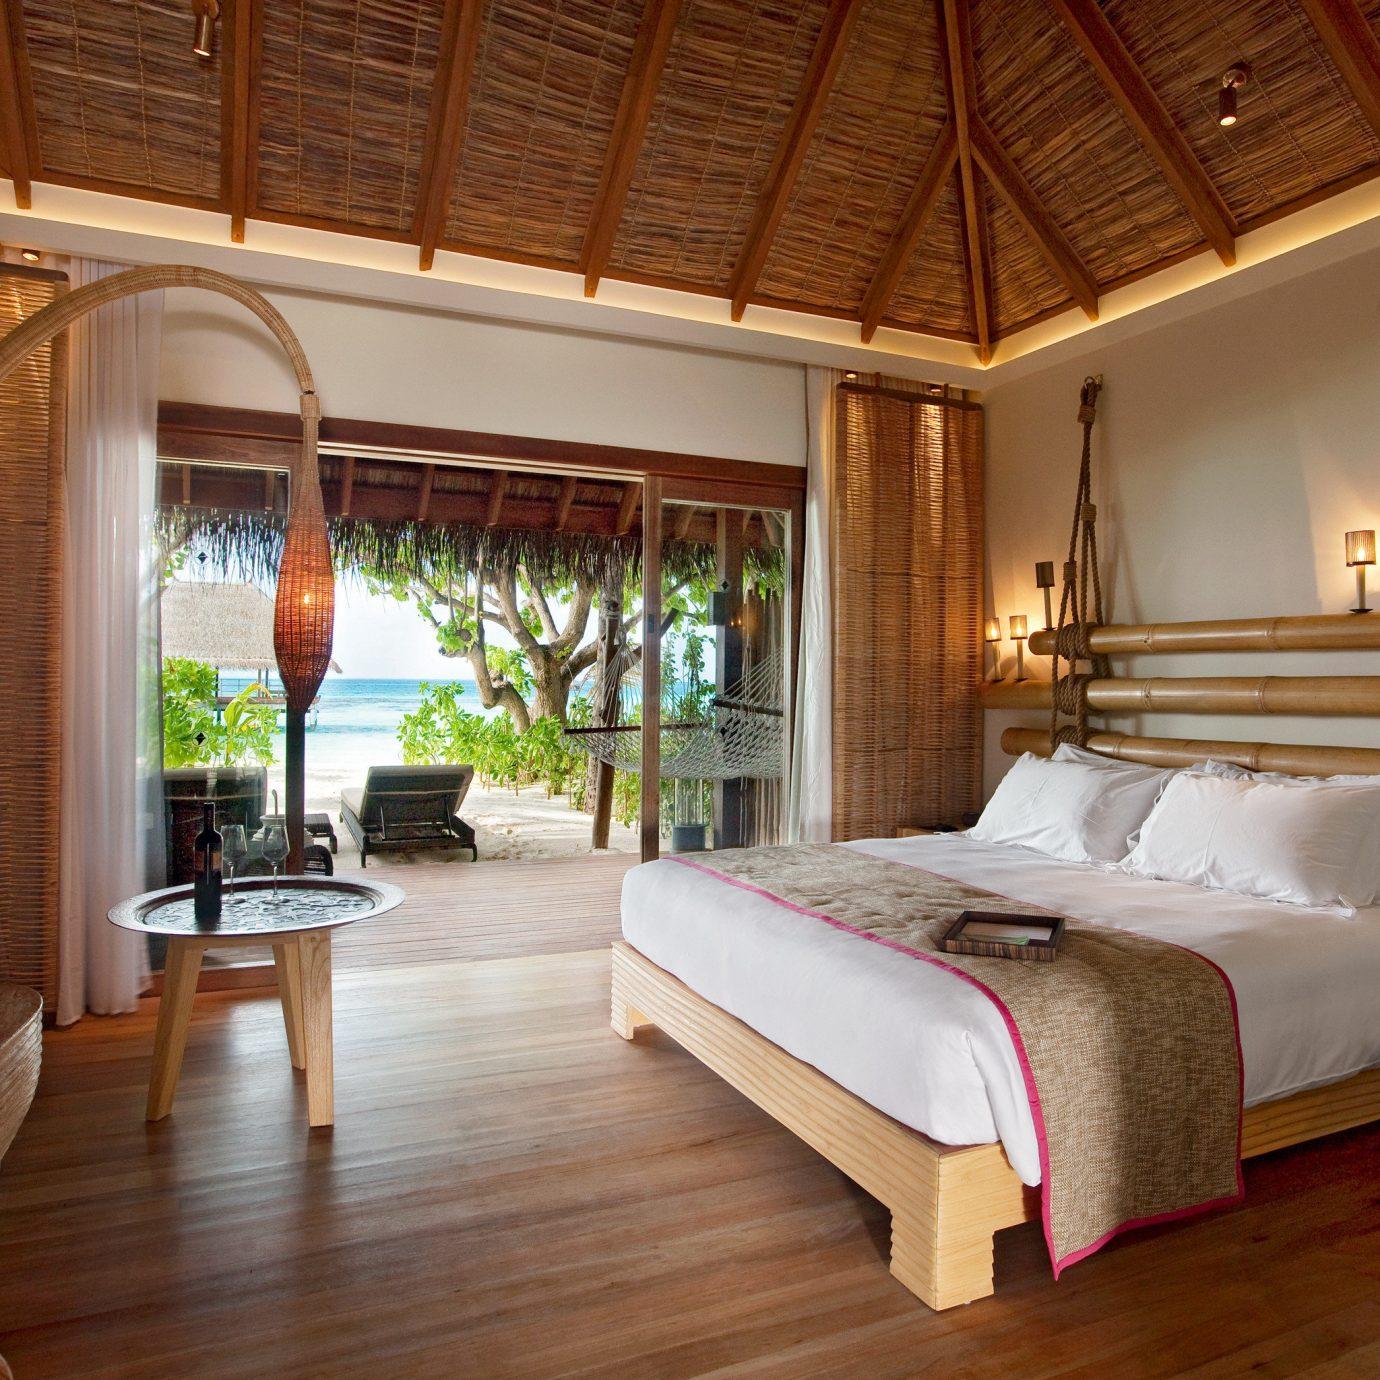 All-Inclusive Resorts Beachfront Bedroom Hotels Island Luxury Romance Romantic property Resort Villa home Suite hardwood cottage living room farmhouse mansion